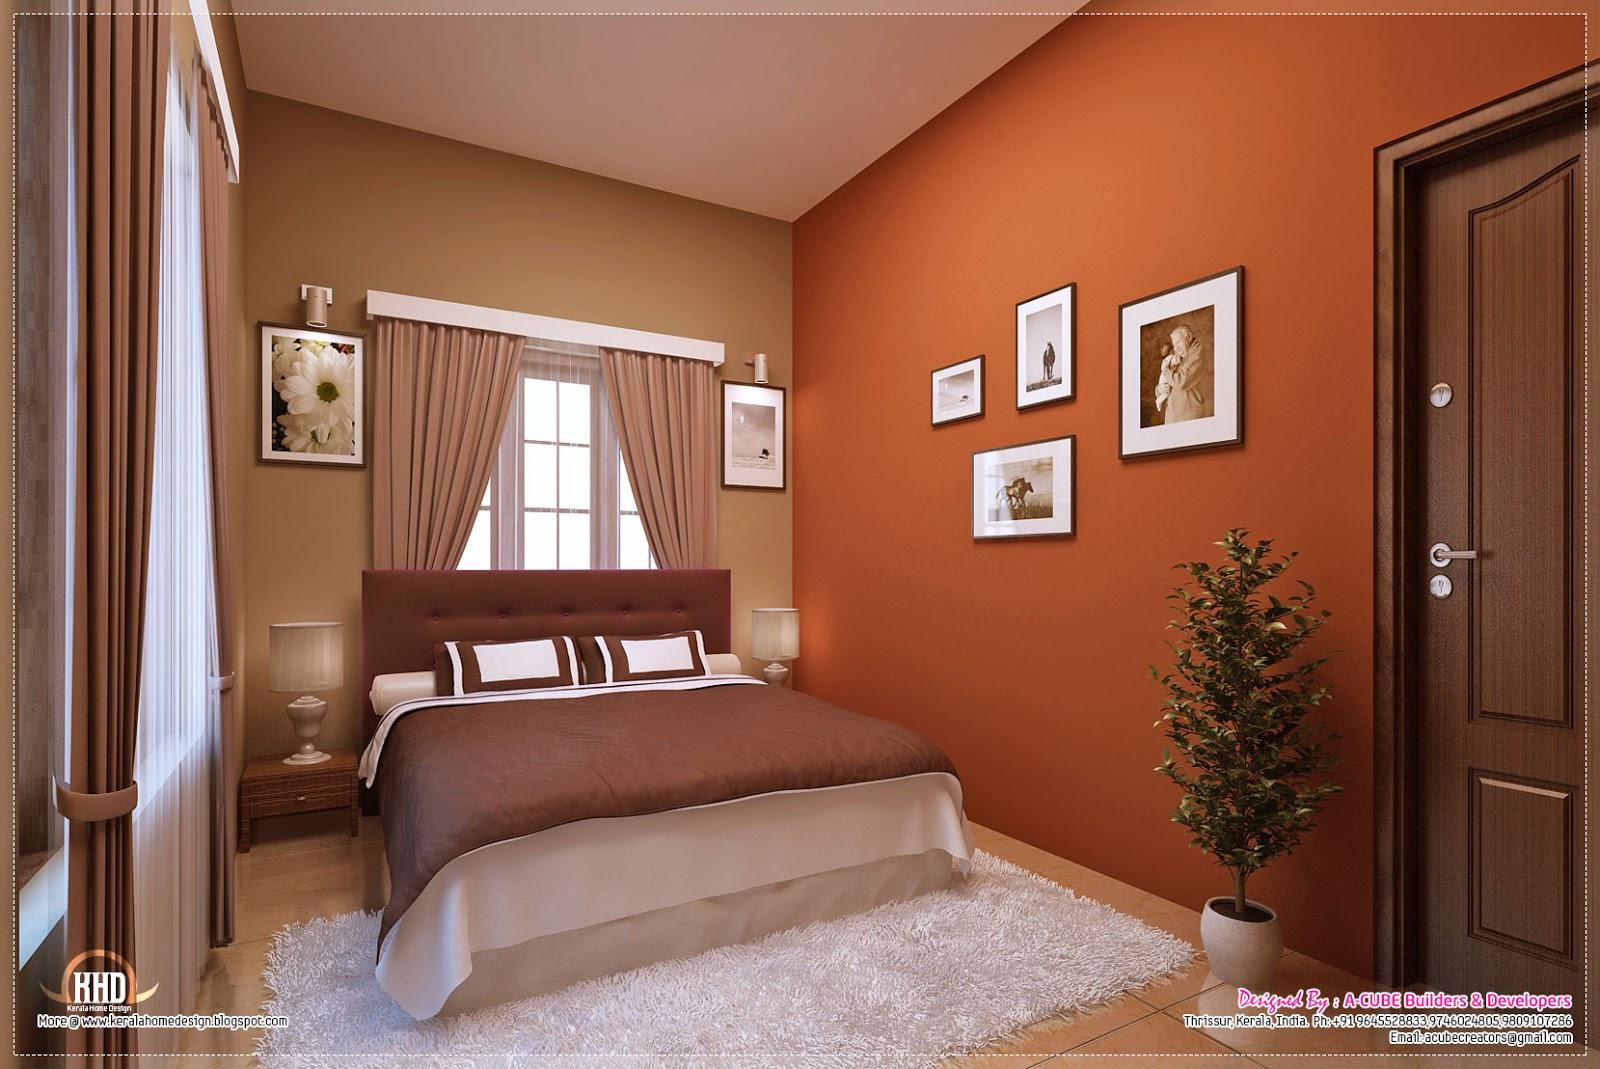 House bedroom interior